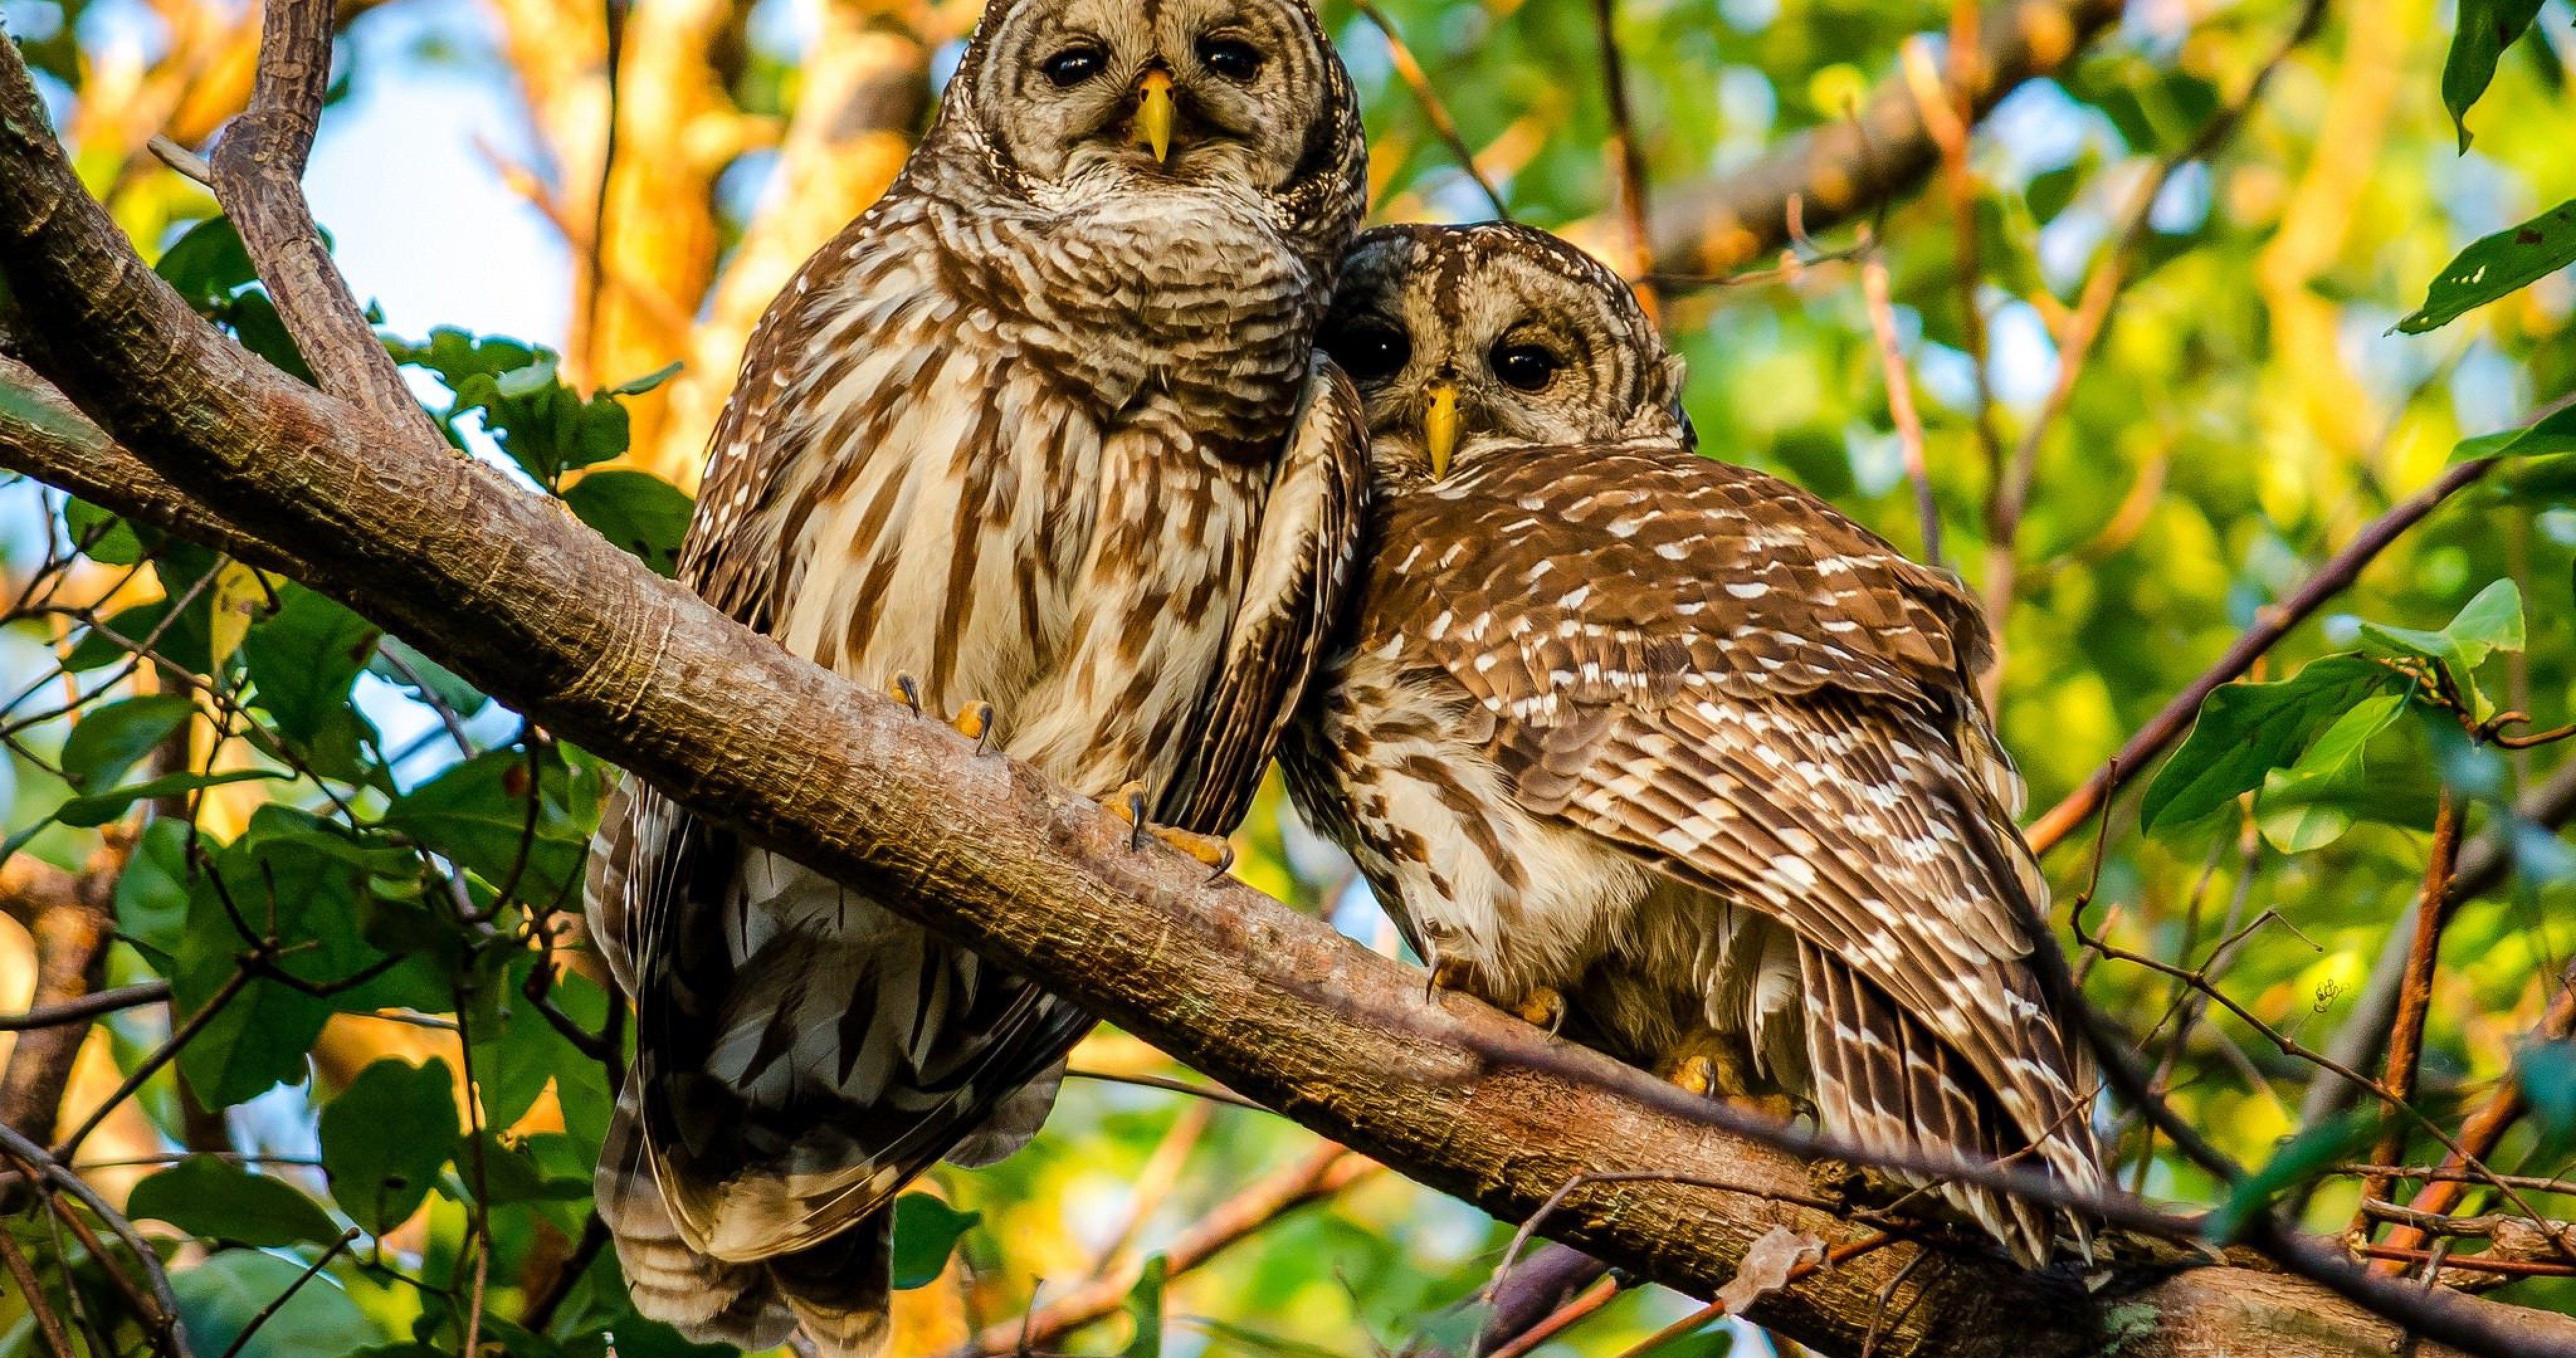 mottled owl 4k ultra hd wallpaper Owl, Birds, Owl bird